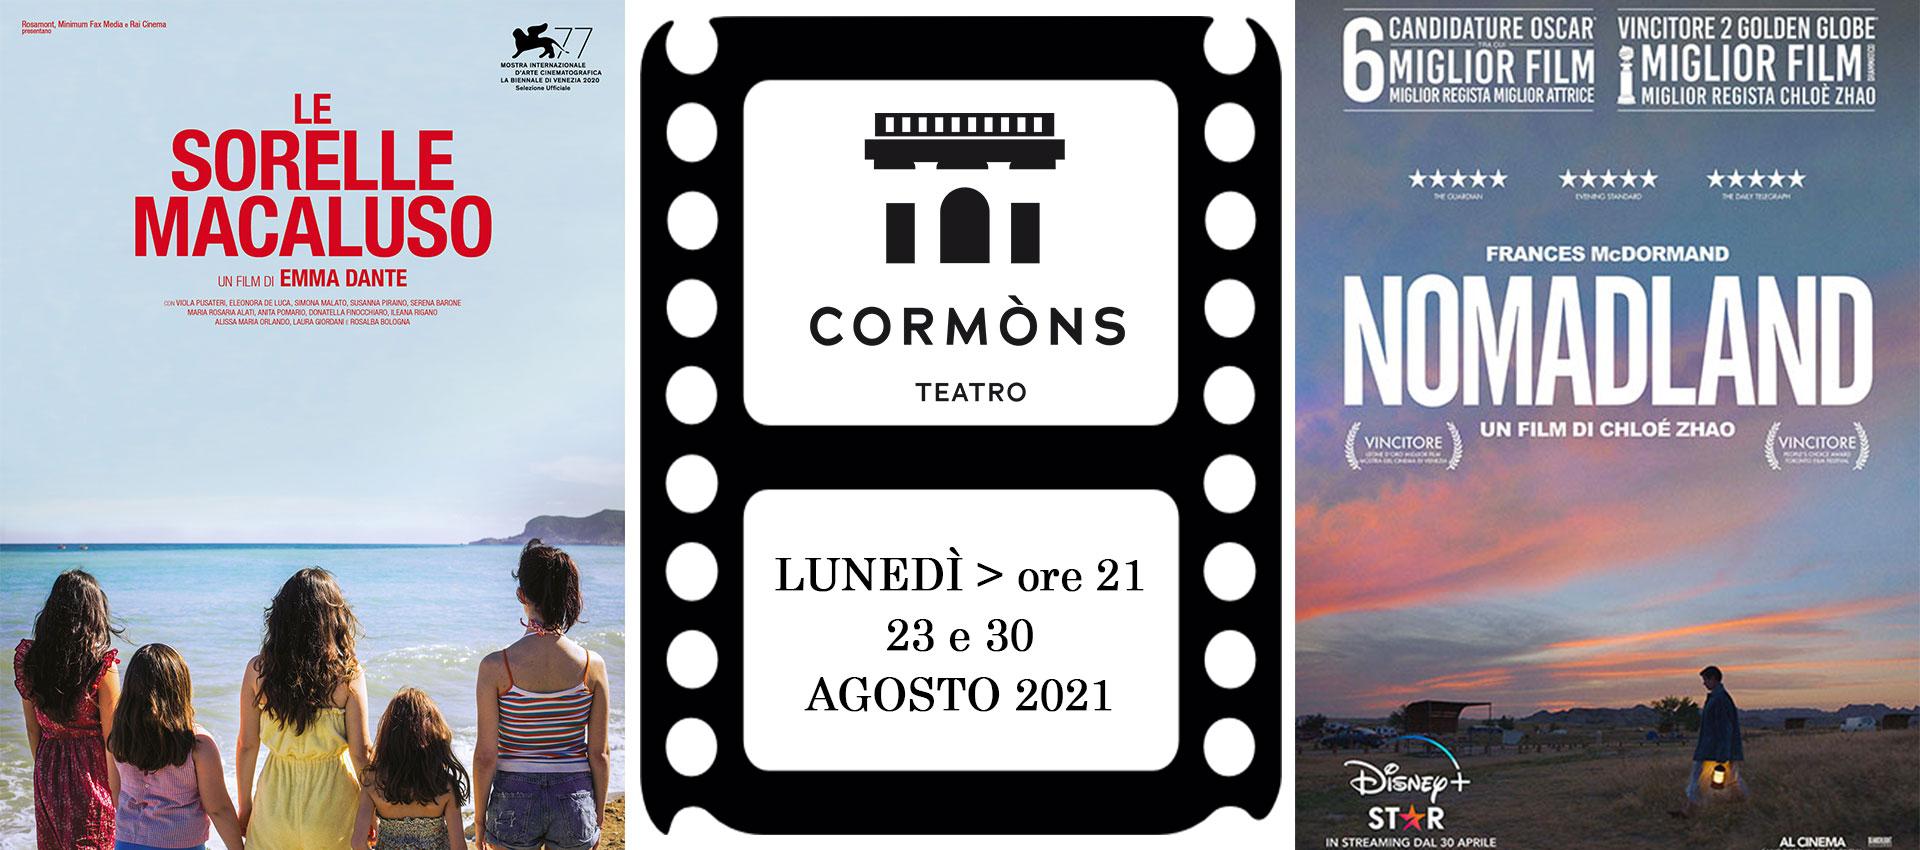 1920x850-home-cinema-agosto-cormons